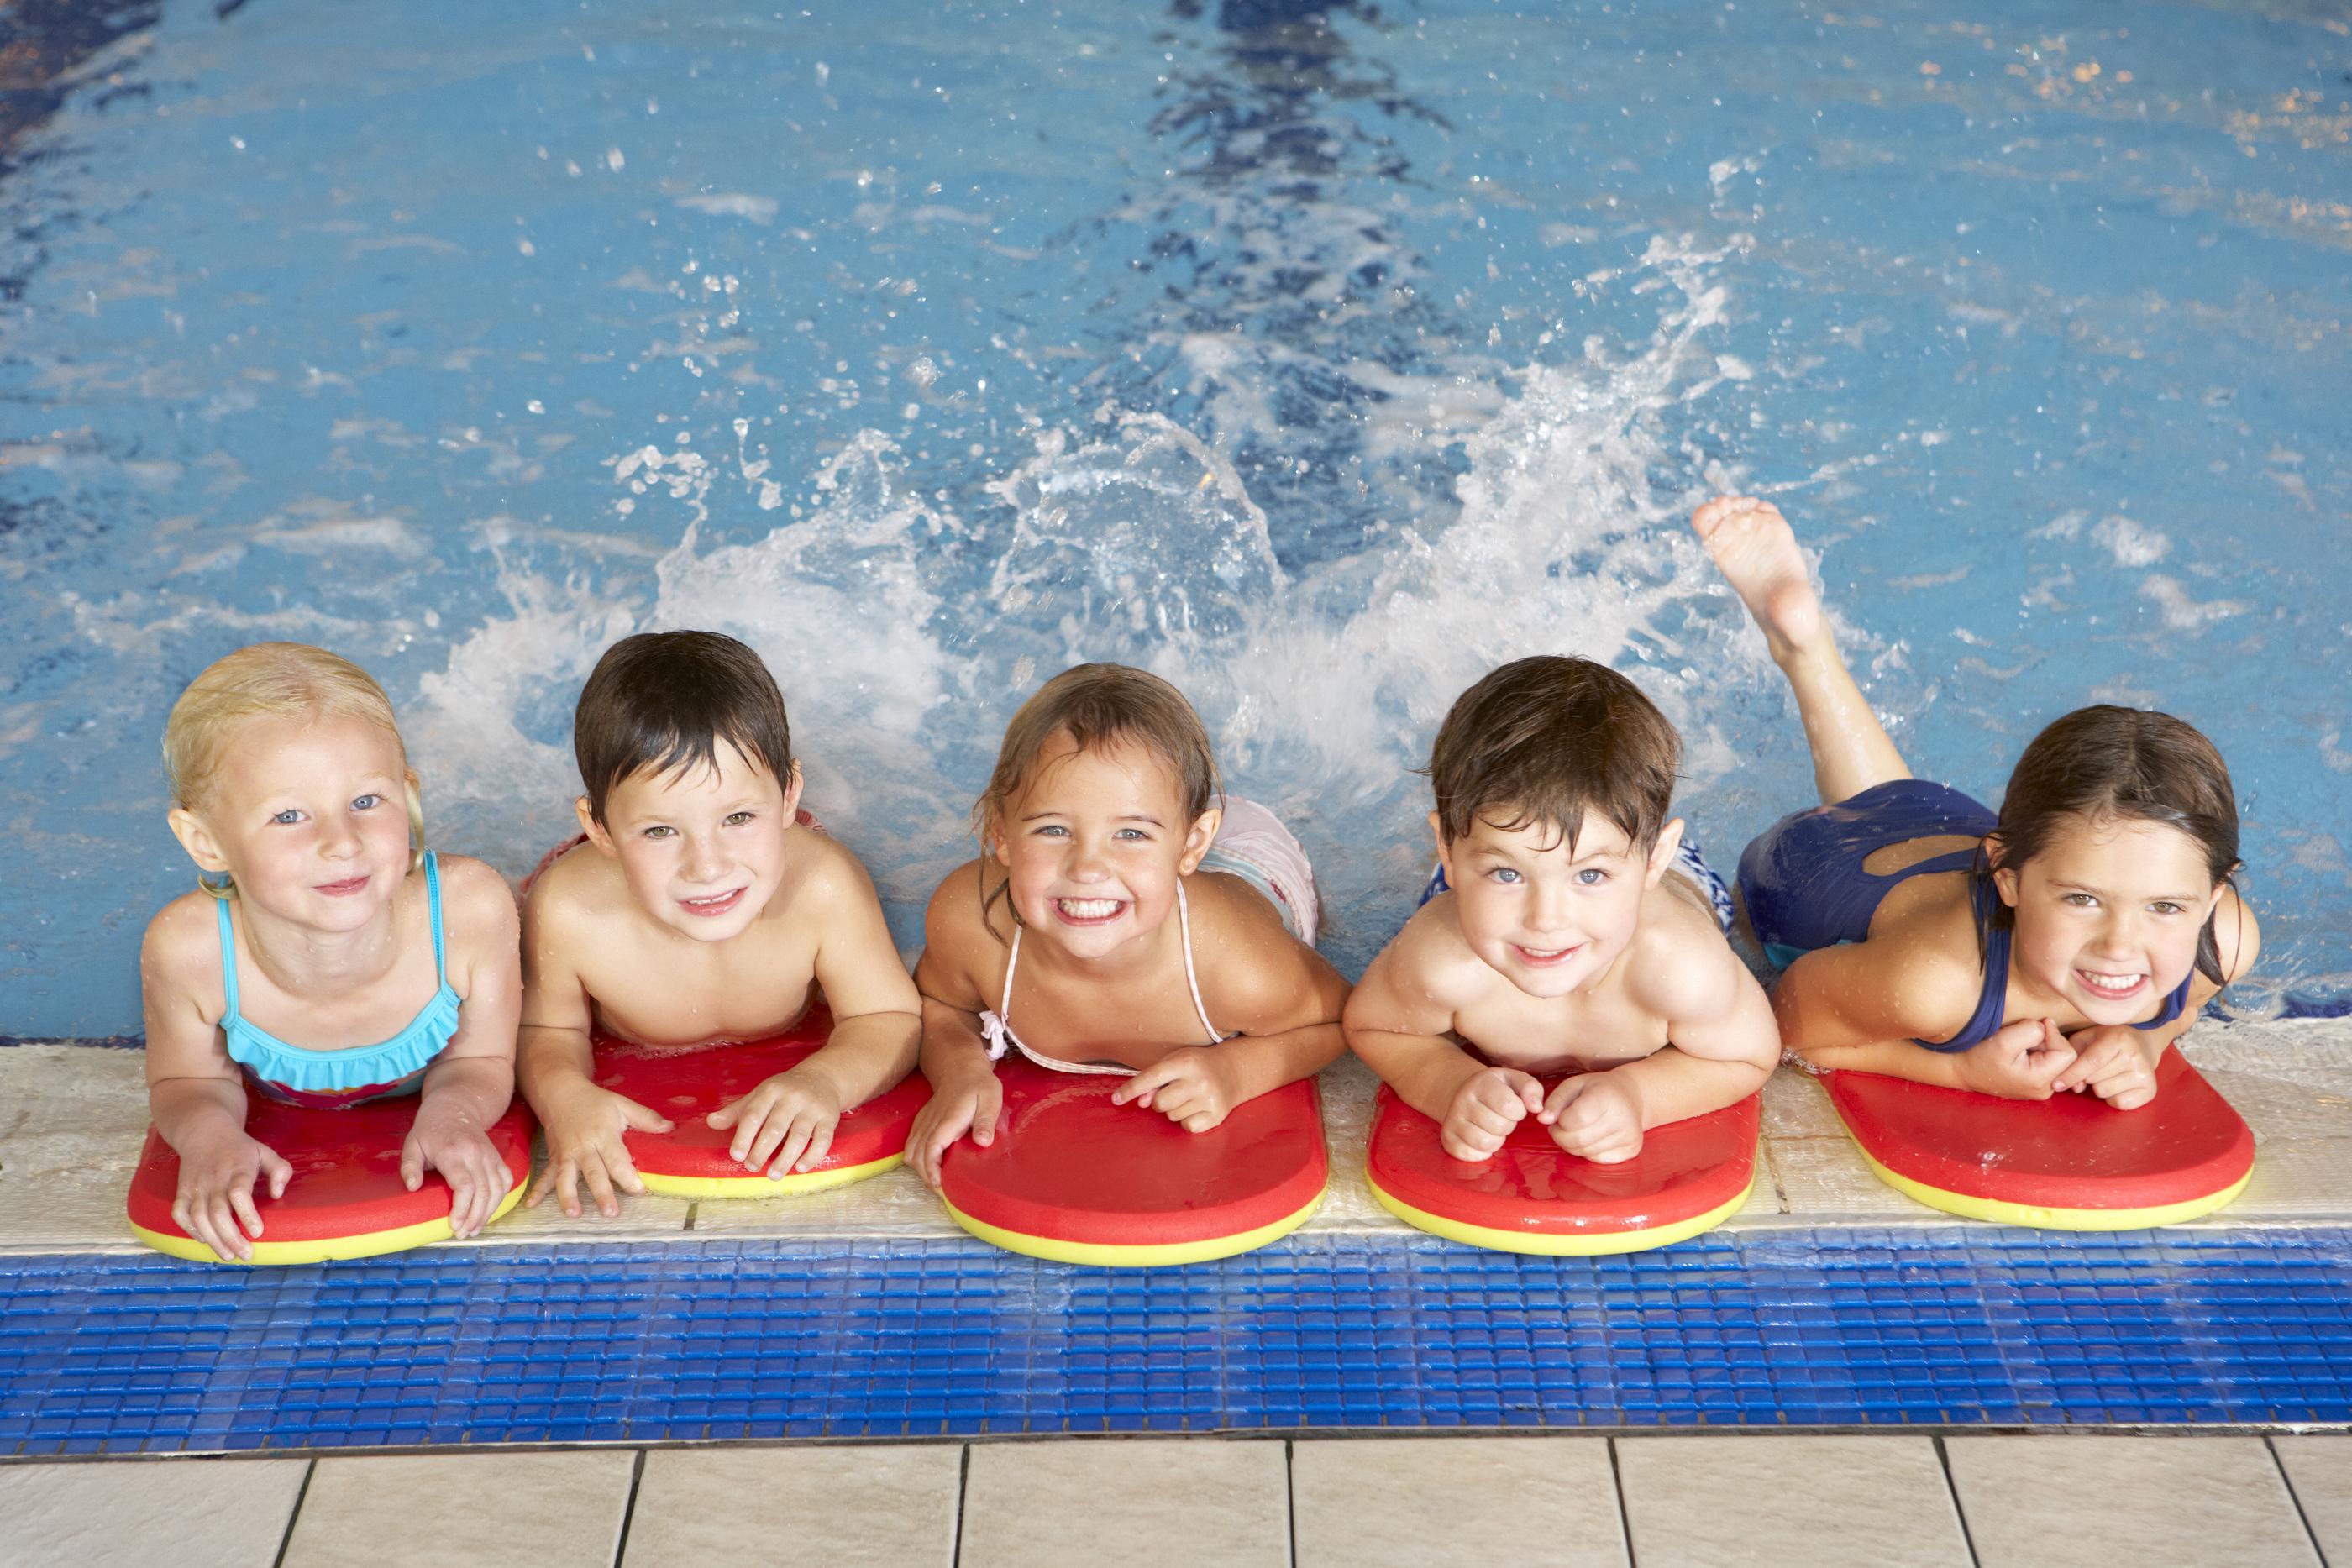 Children in swimming pool.jpg